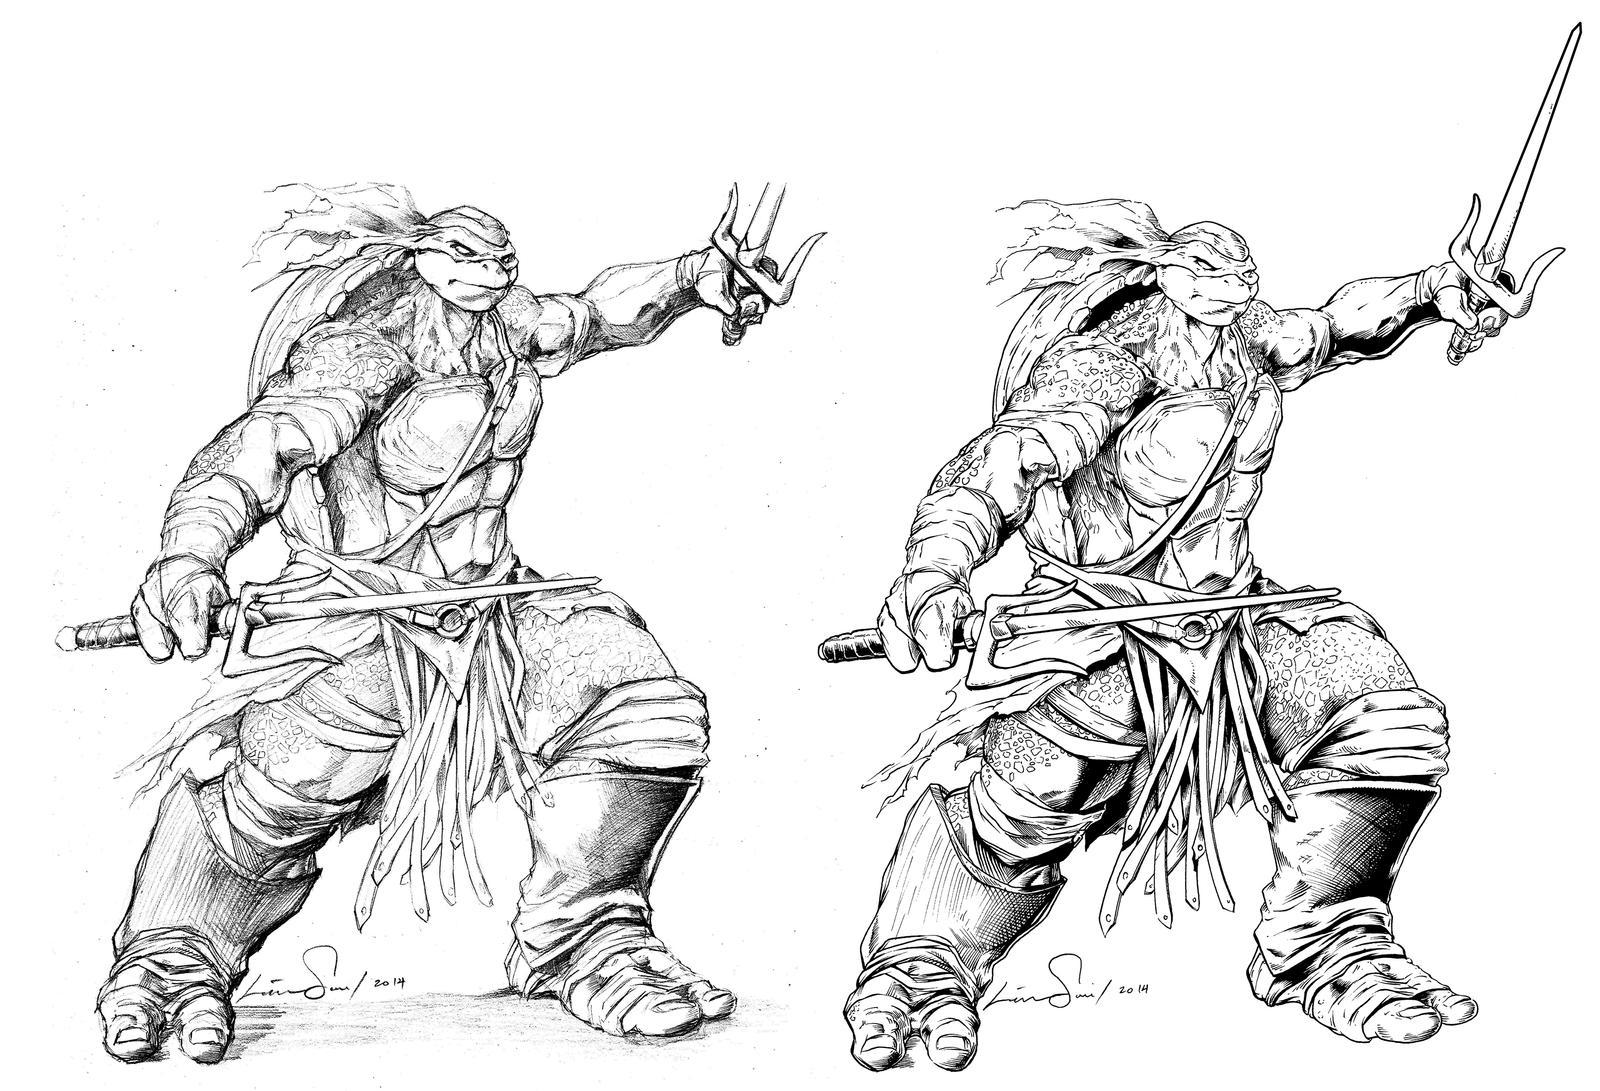 Raphael of the teenage mutant ninja turtles by cadre on for Ninja turtles raphael coloring pages